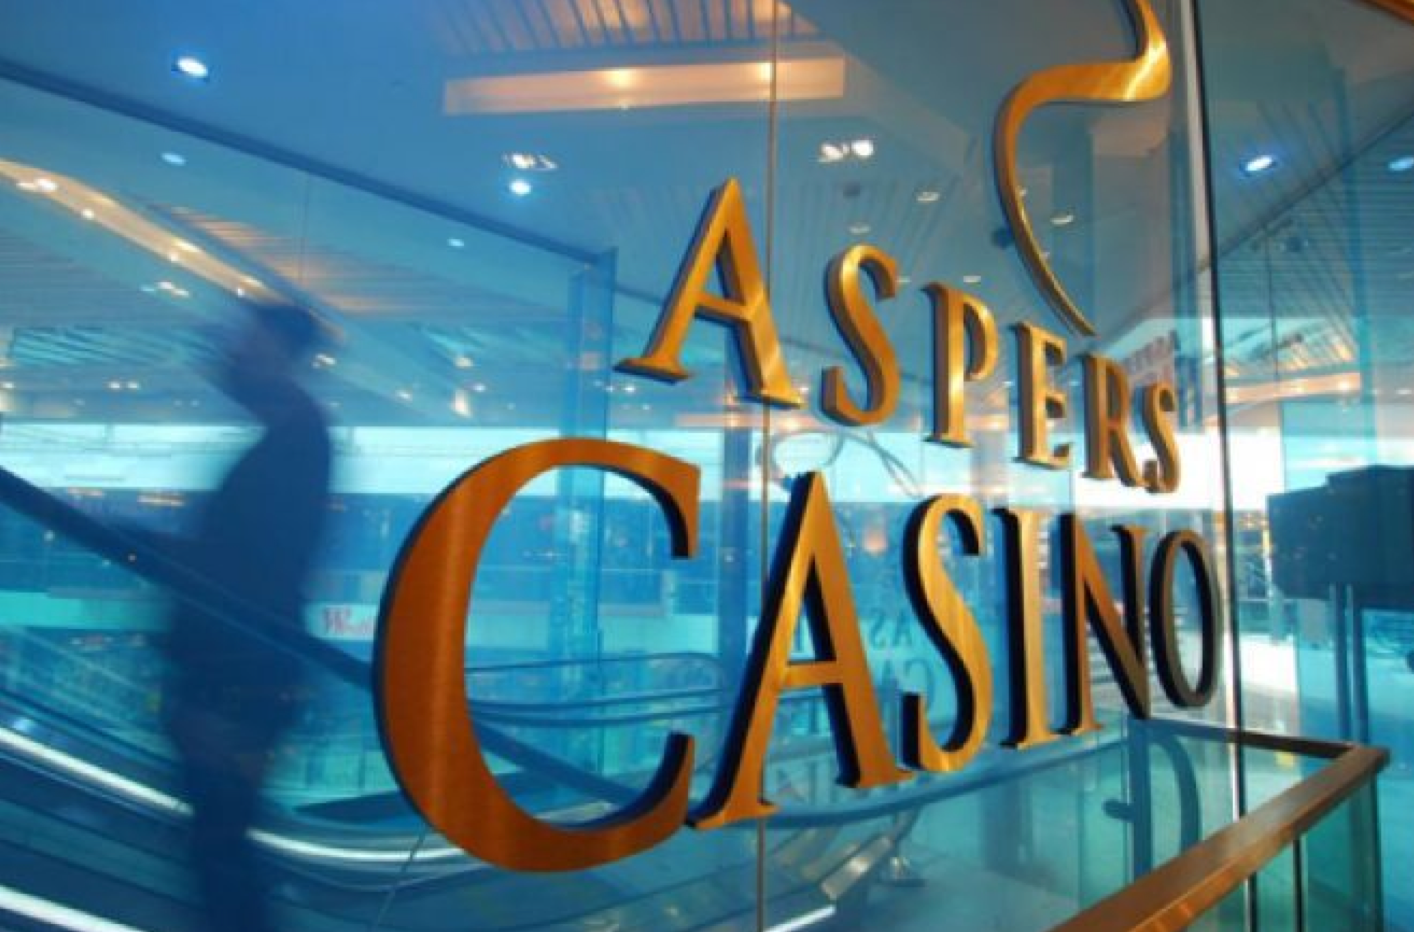 Aspers casino cash games geant casino compte smiles